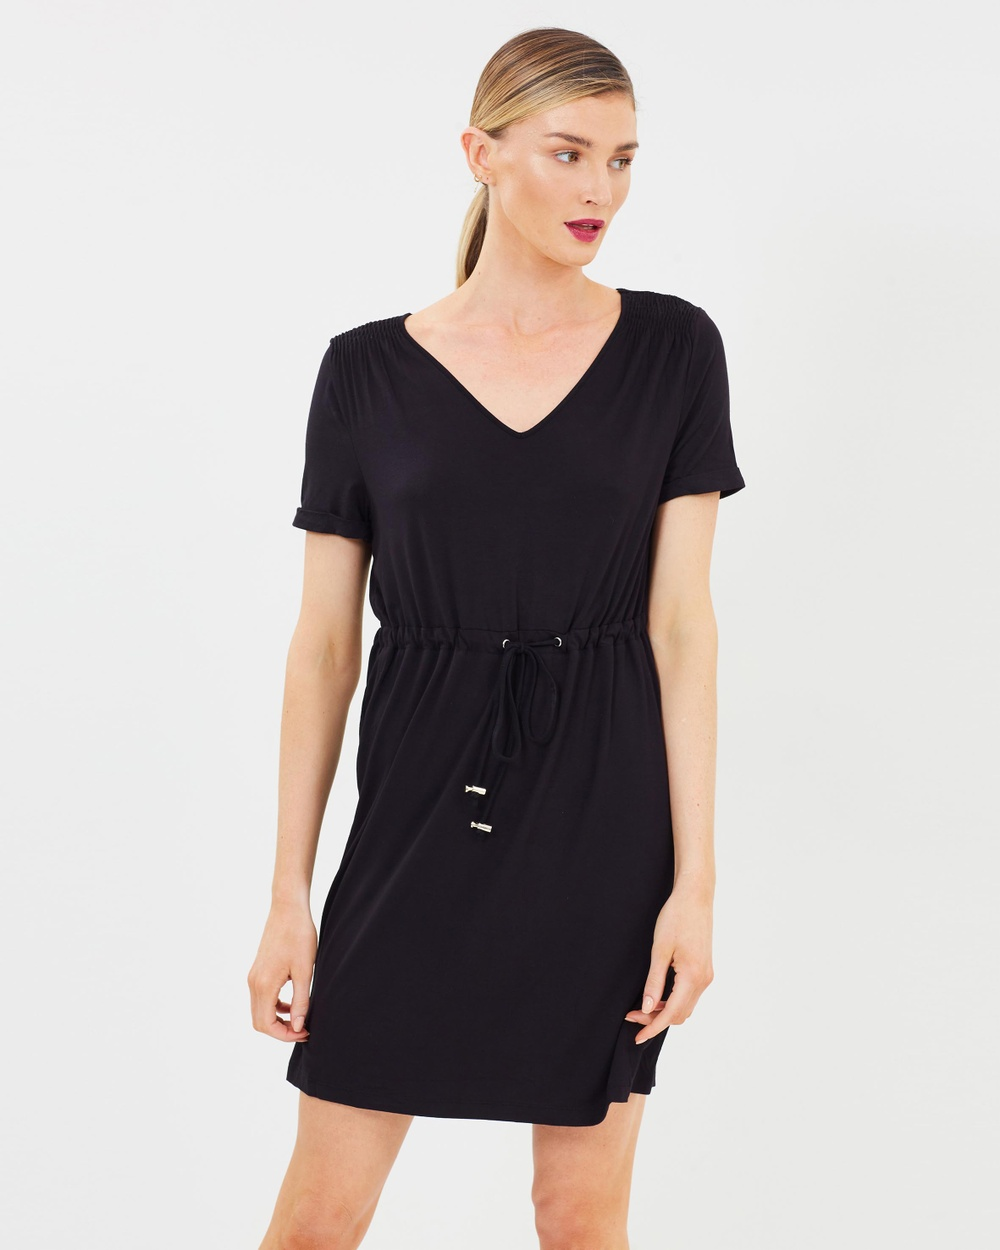 Dorothy Perkins T Shirt Dress Dresses Black T-Shirt Dress